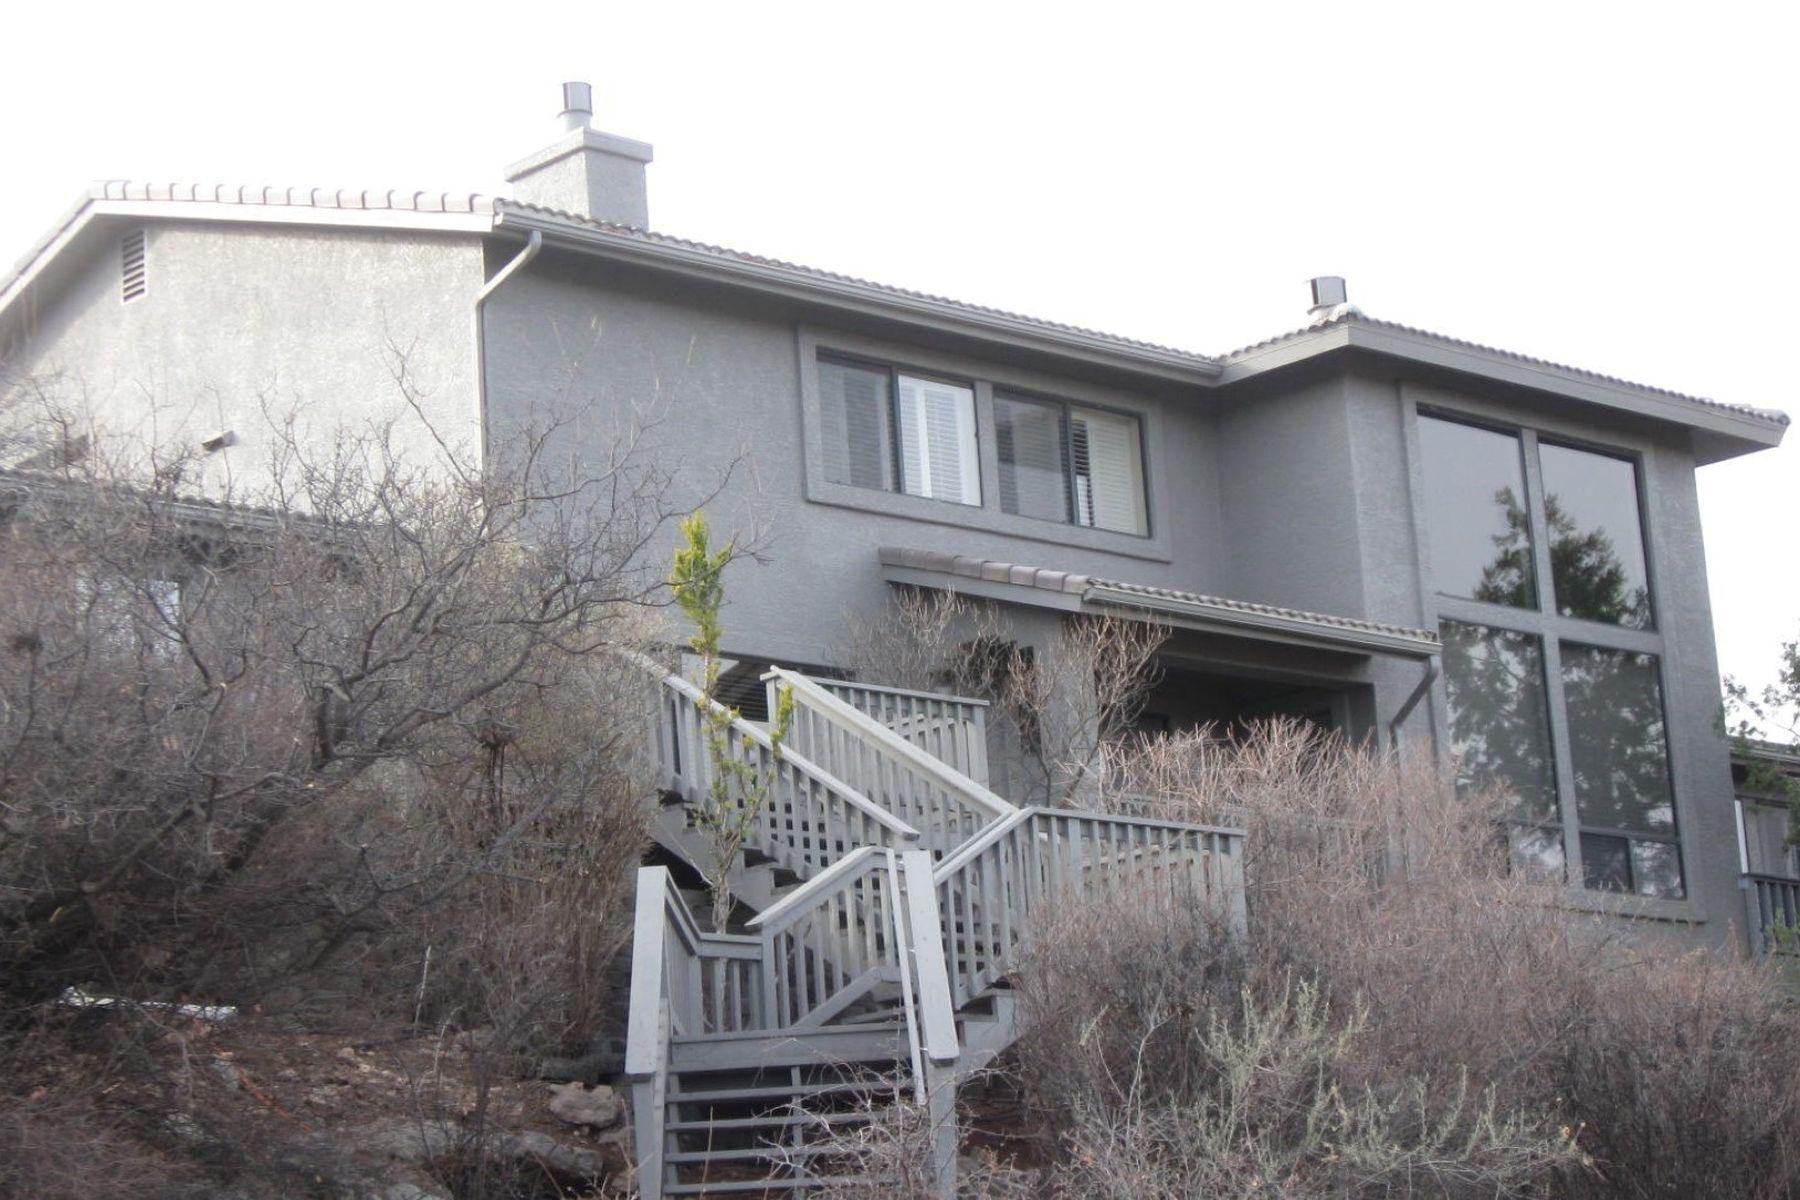 Casa Unifamiliar por un Venta en Wonderful One Owner Sedona Home 3785 E Montezuma Ave, Rimrock, Arizona, 86335 Estados Unidos